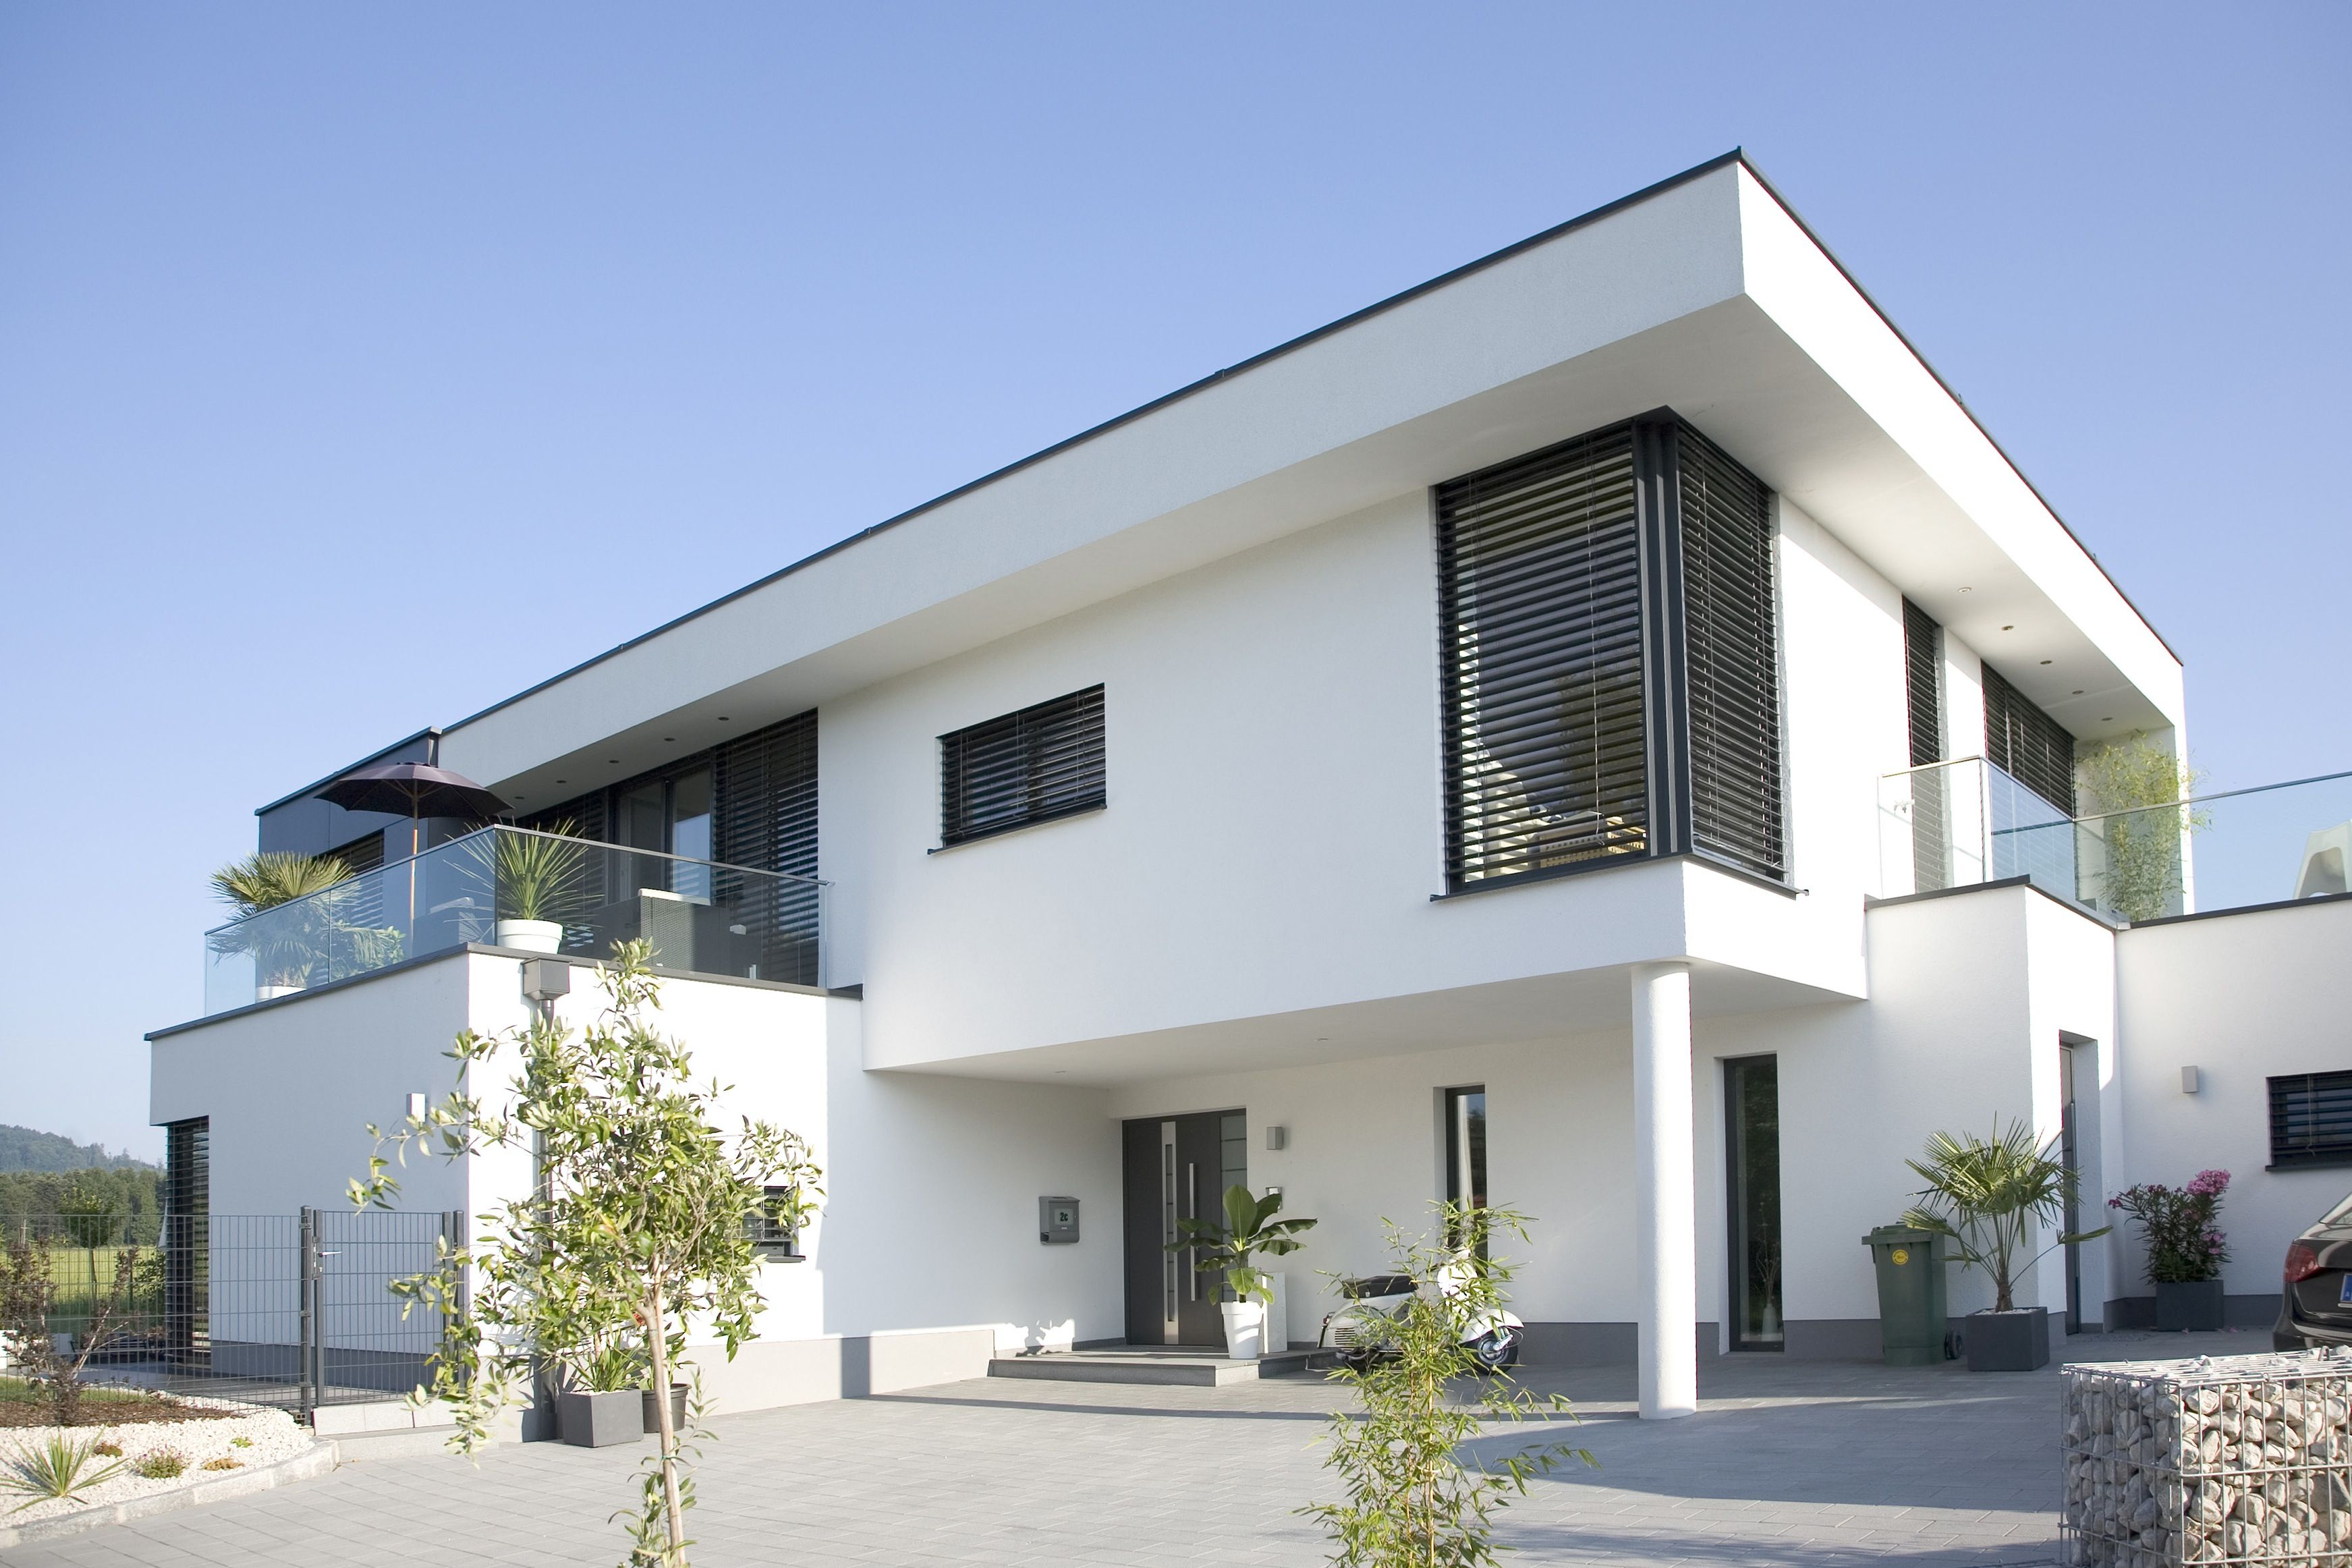 kunststoff aluminium fenster kf 410 fotocredit internorm architecture pinterest. Black Bedroom Furniture Sets. Home Design Ideas